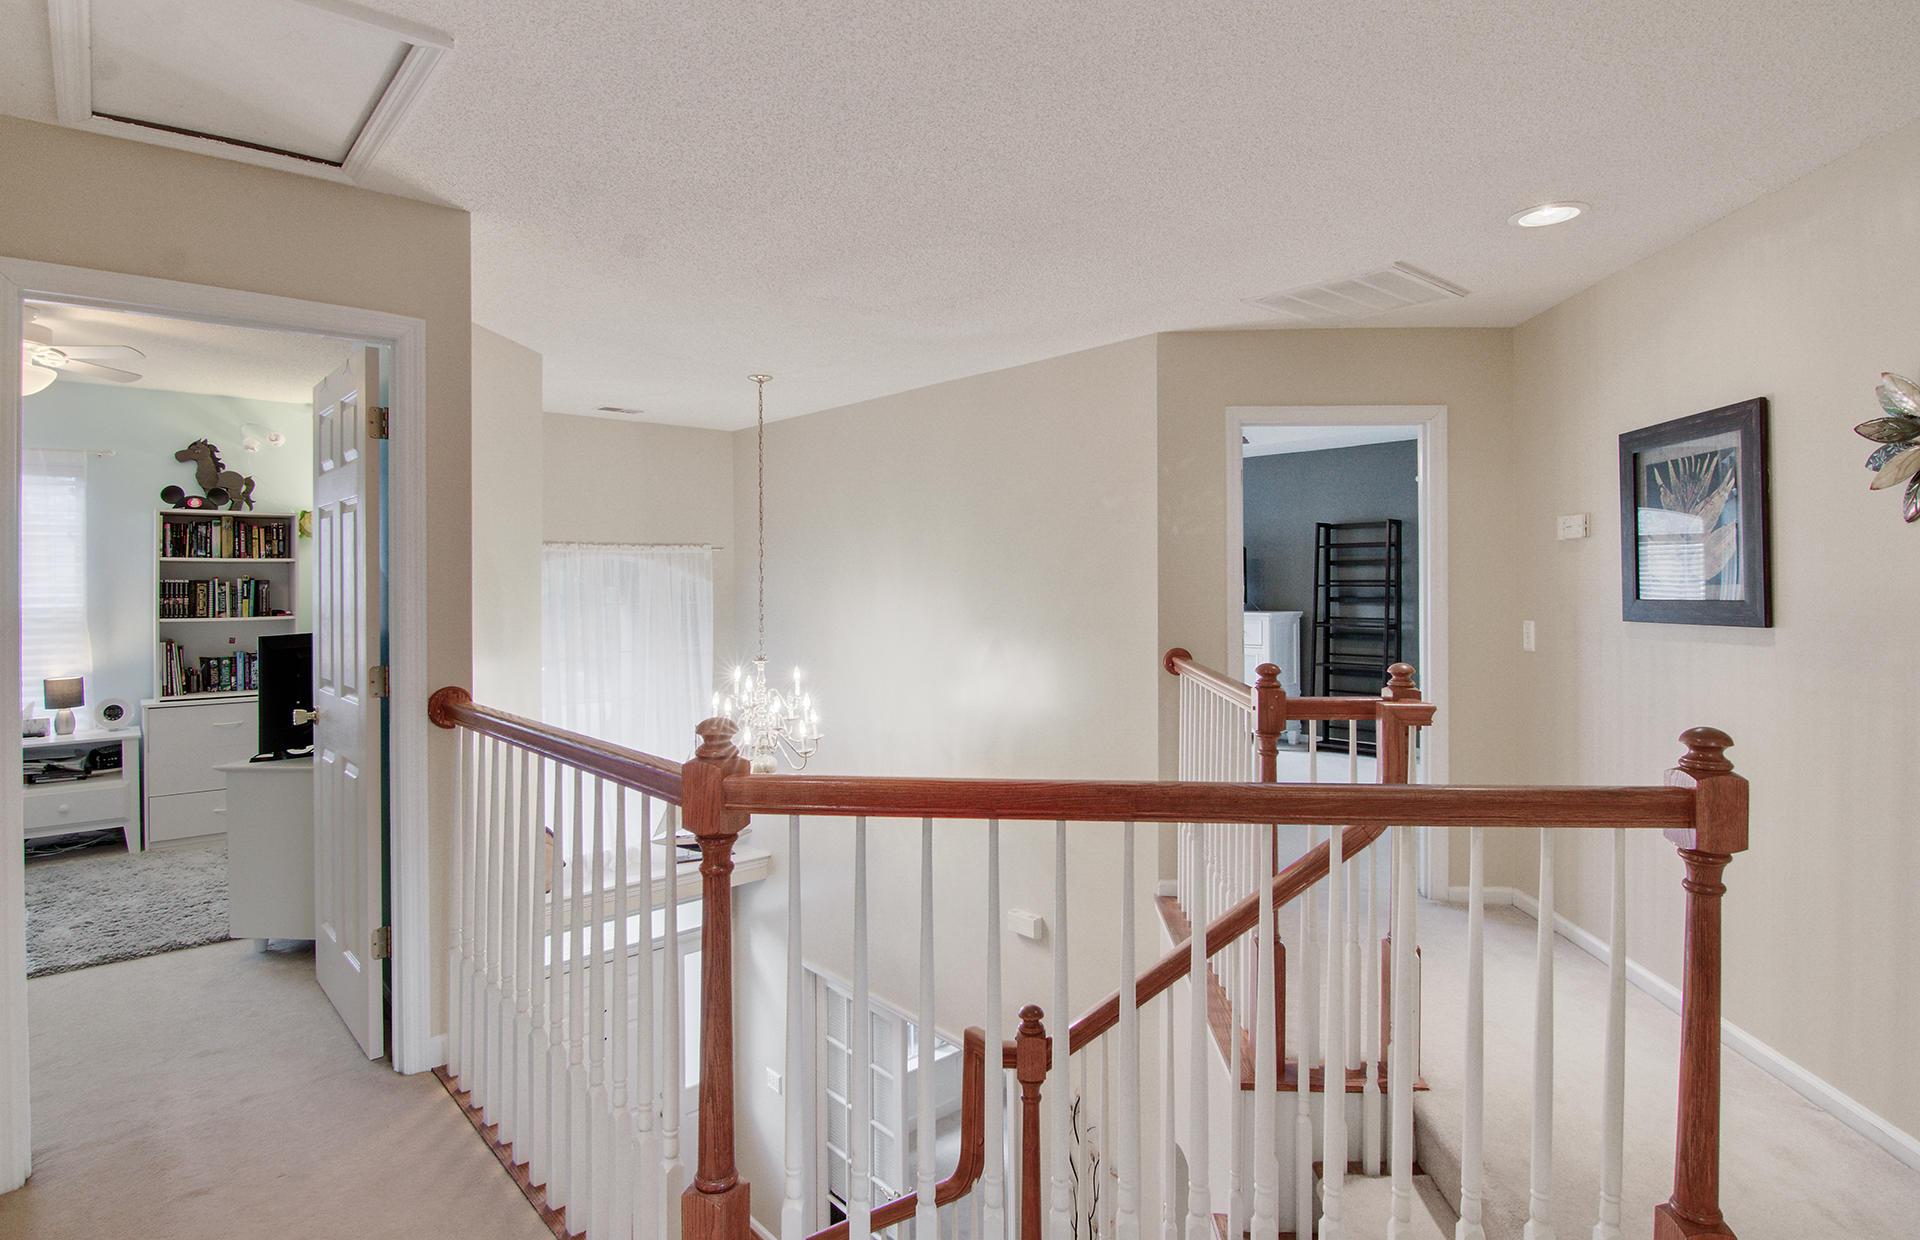 Belle Hall Homes For Sale - 192 Revolution, Mount Pleasant, SC - 19